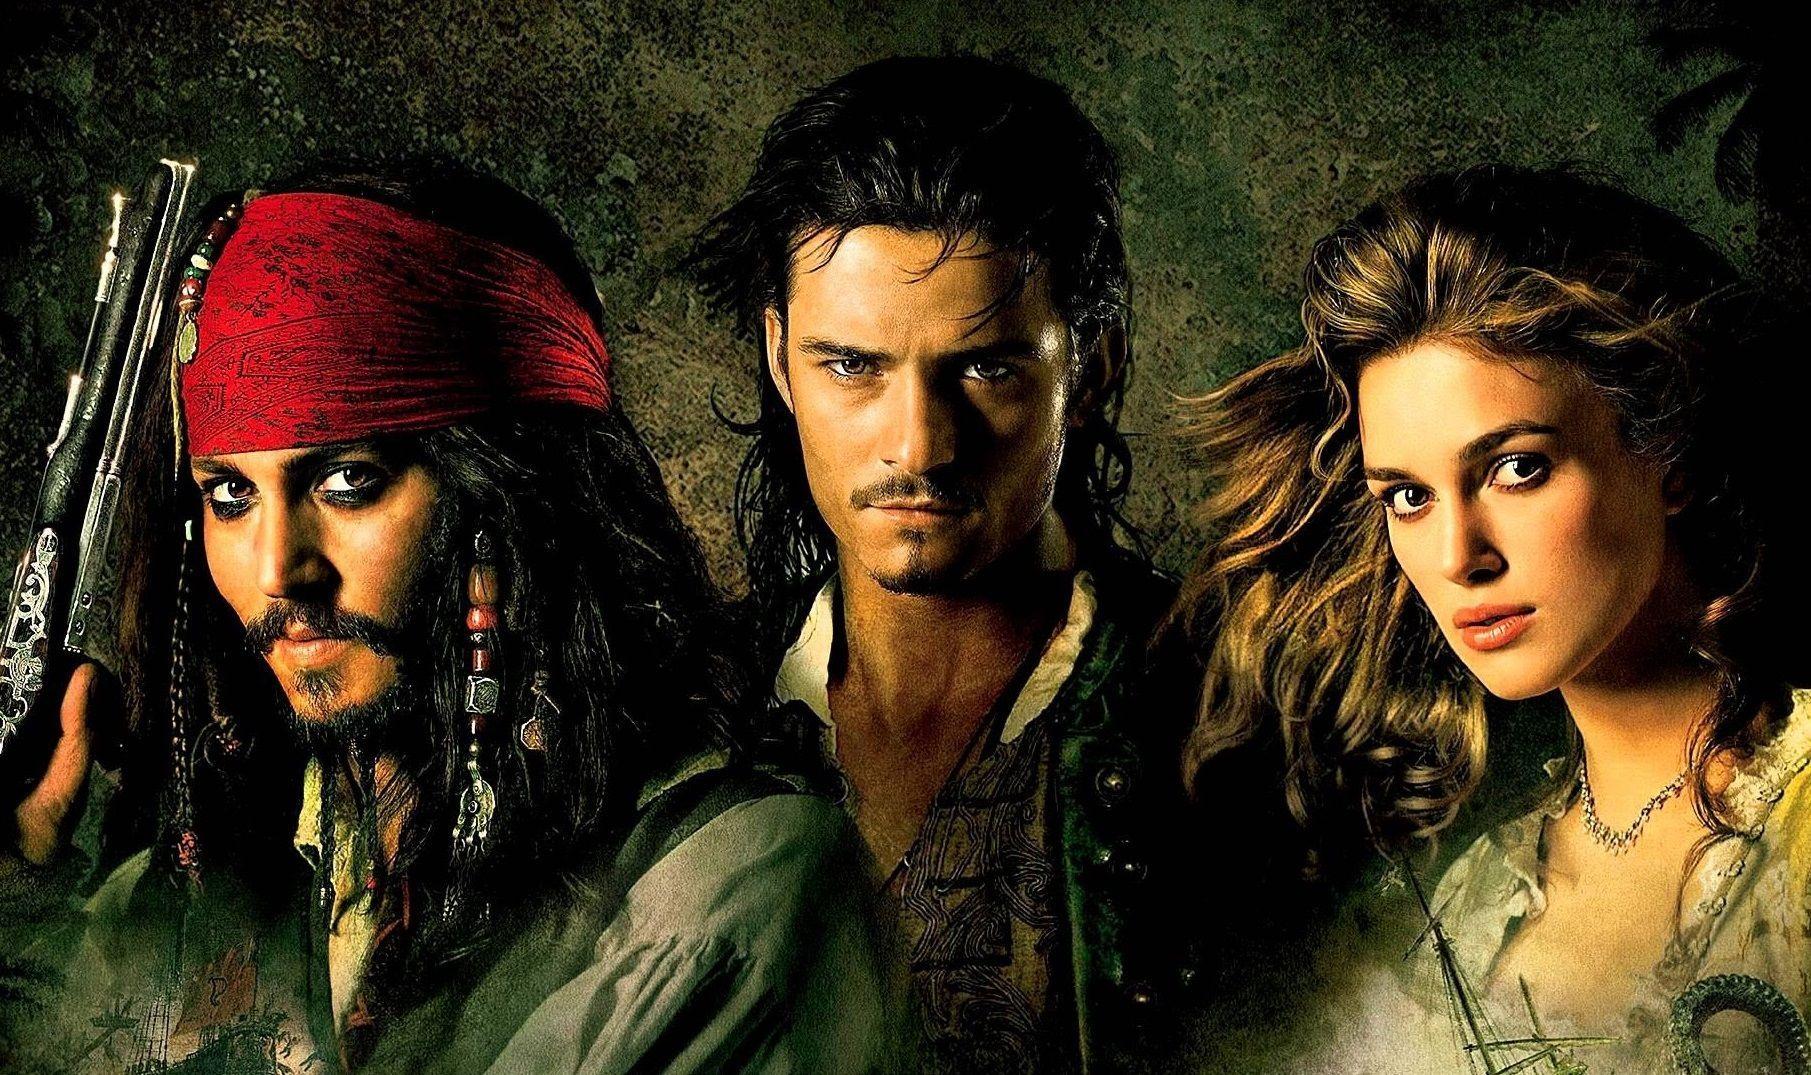 12986 - Test para verdaderos piratas. ¿Podrás estar a la altura?